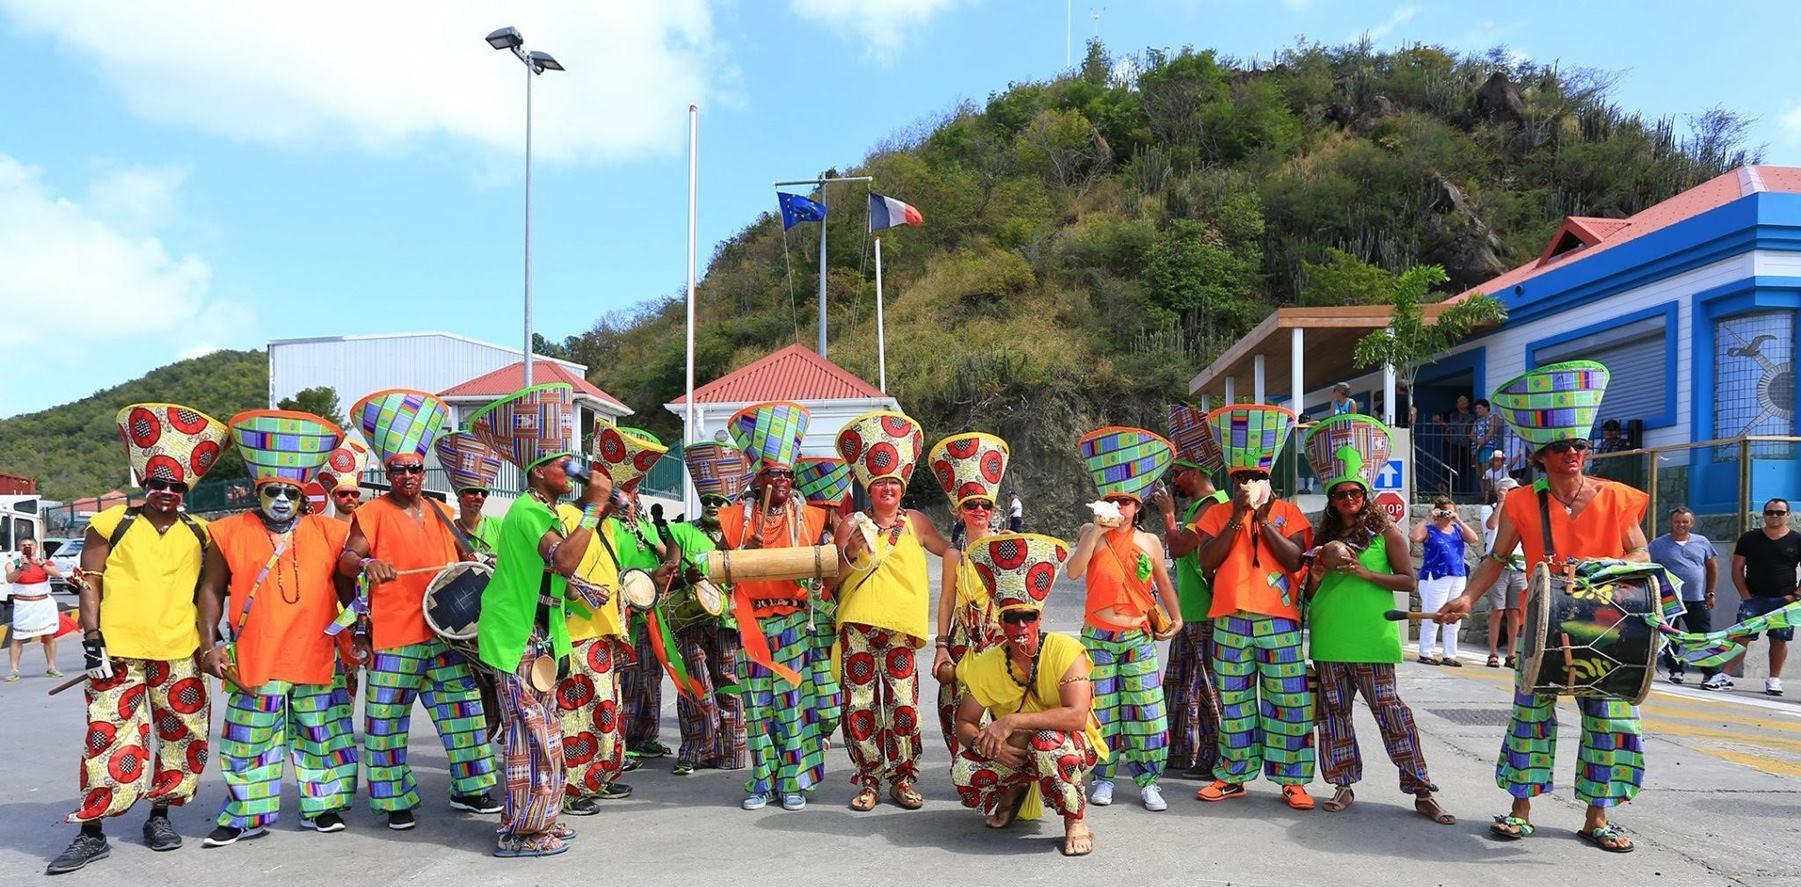 Carnaval de Saint-Barth 1c